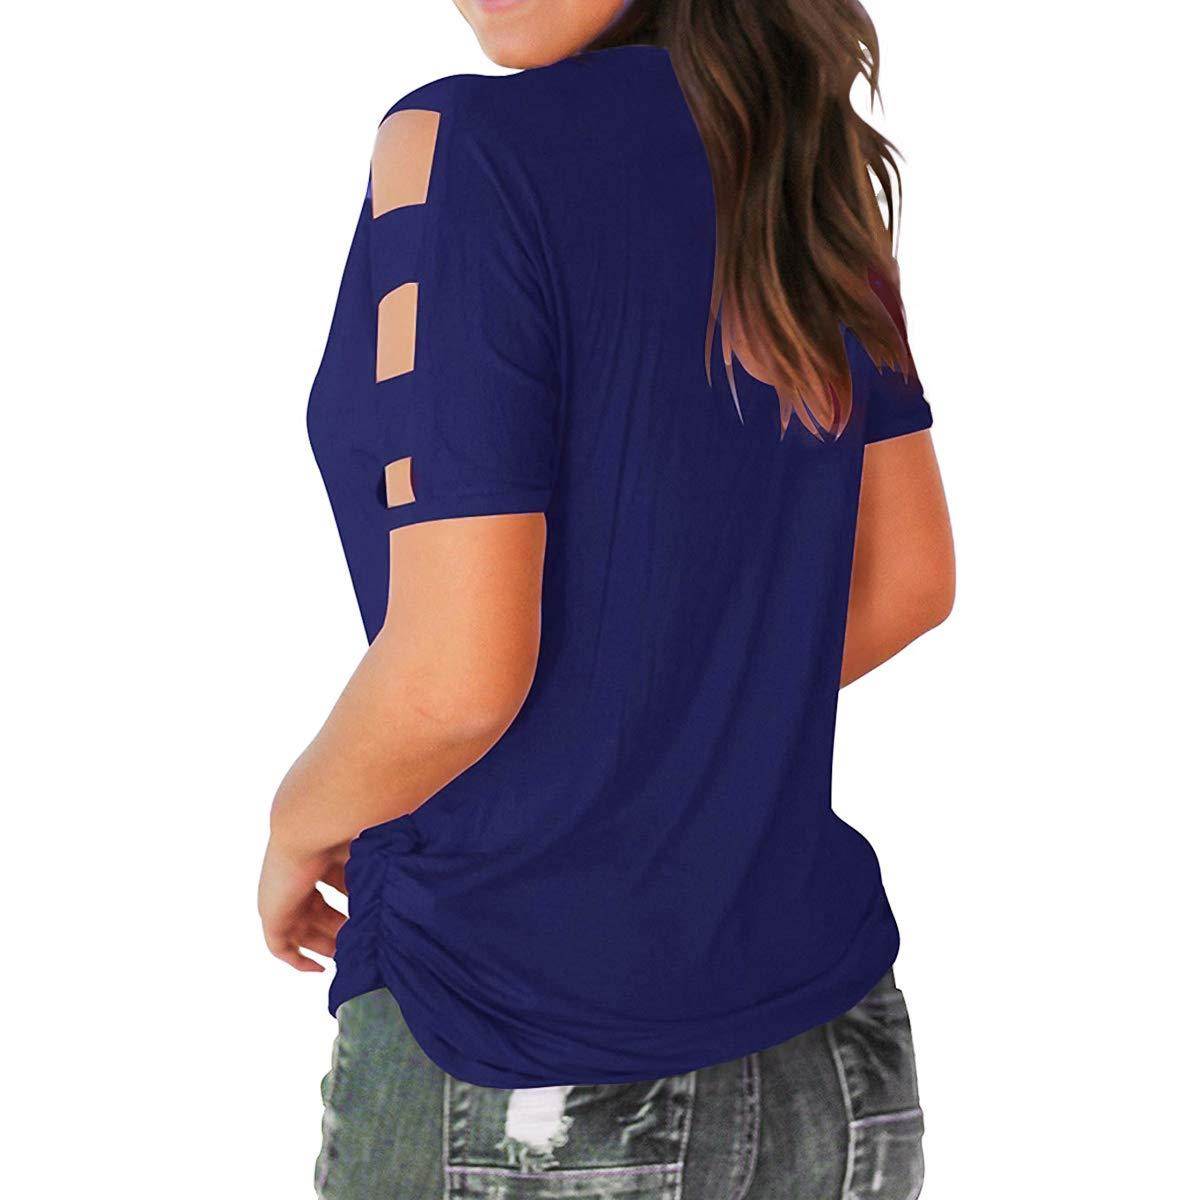 Eanklosco Womens Summer Short Sleeve Cold Shoulder Tops V Neck Basic T Shirts (Blue, XL)